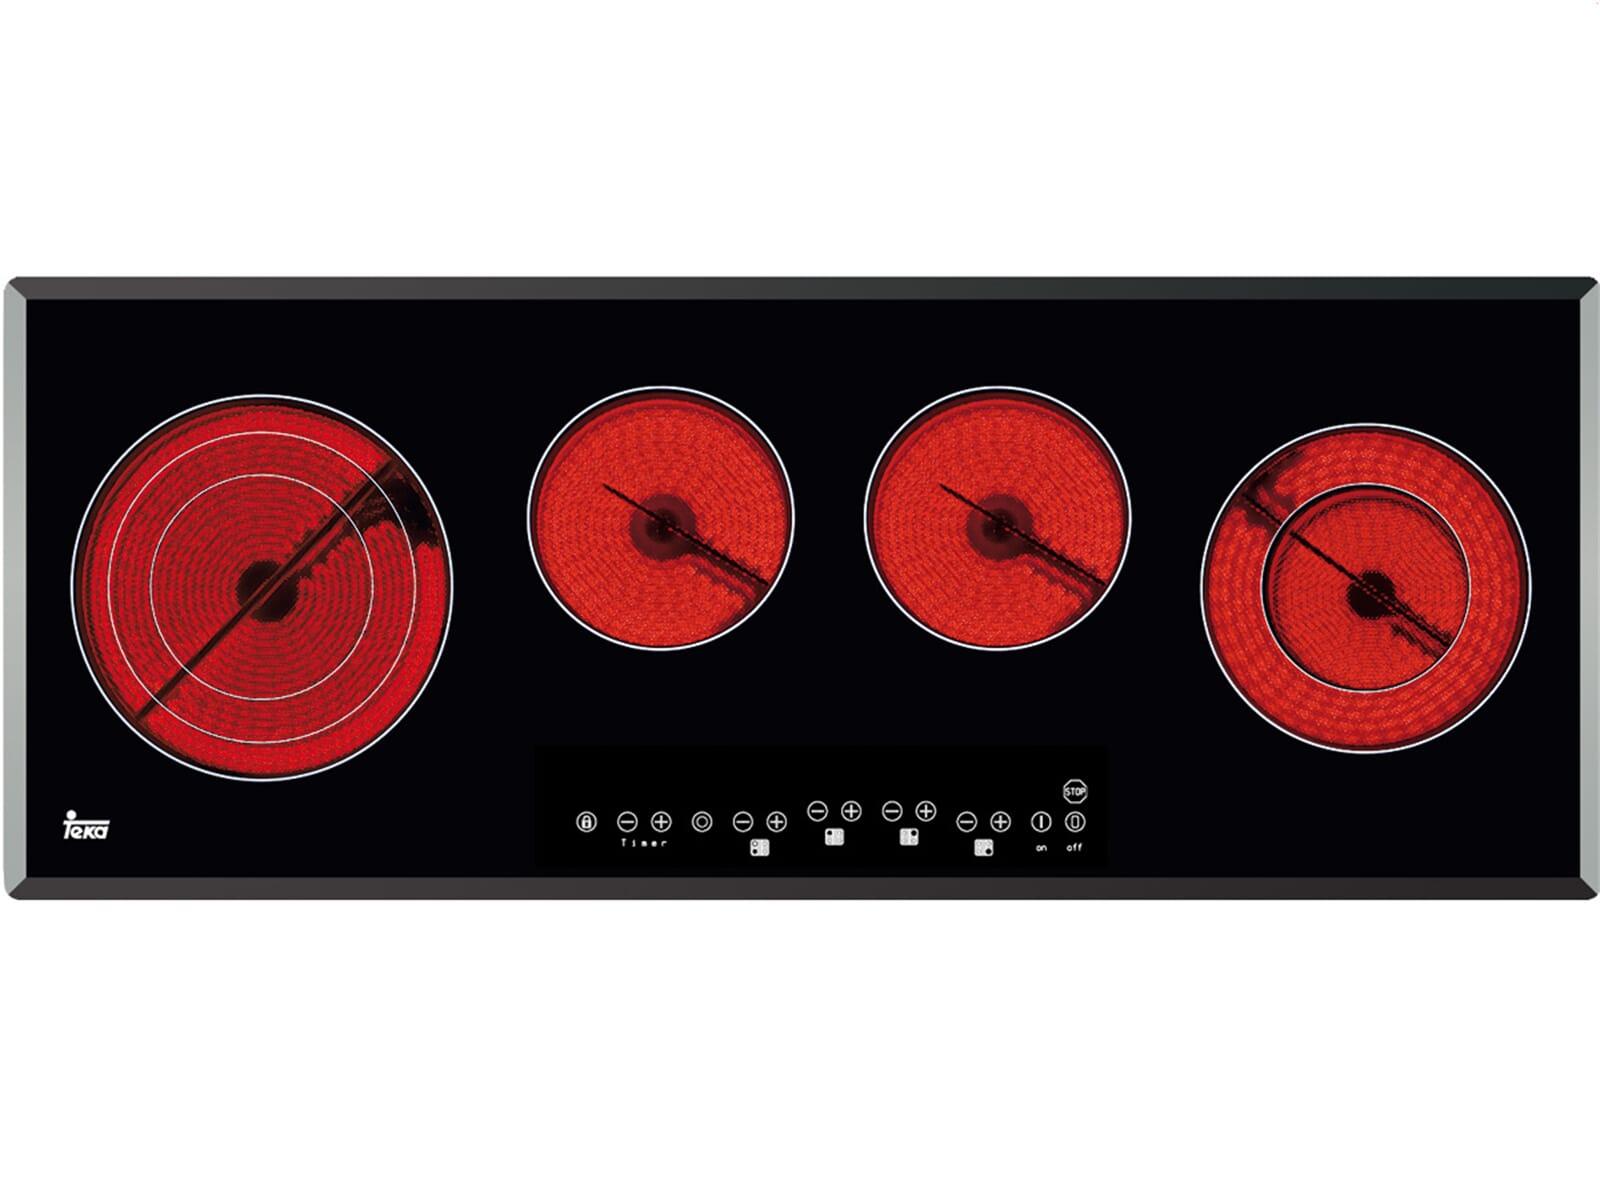 teka tr 941 hz glaskeramik kochfeld autark f r 454 80 eur. Black Bedroom Furniture Sets. Home Design Ideas